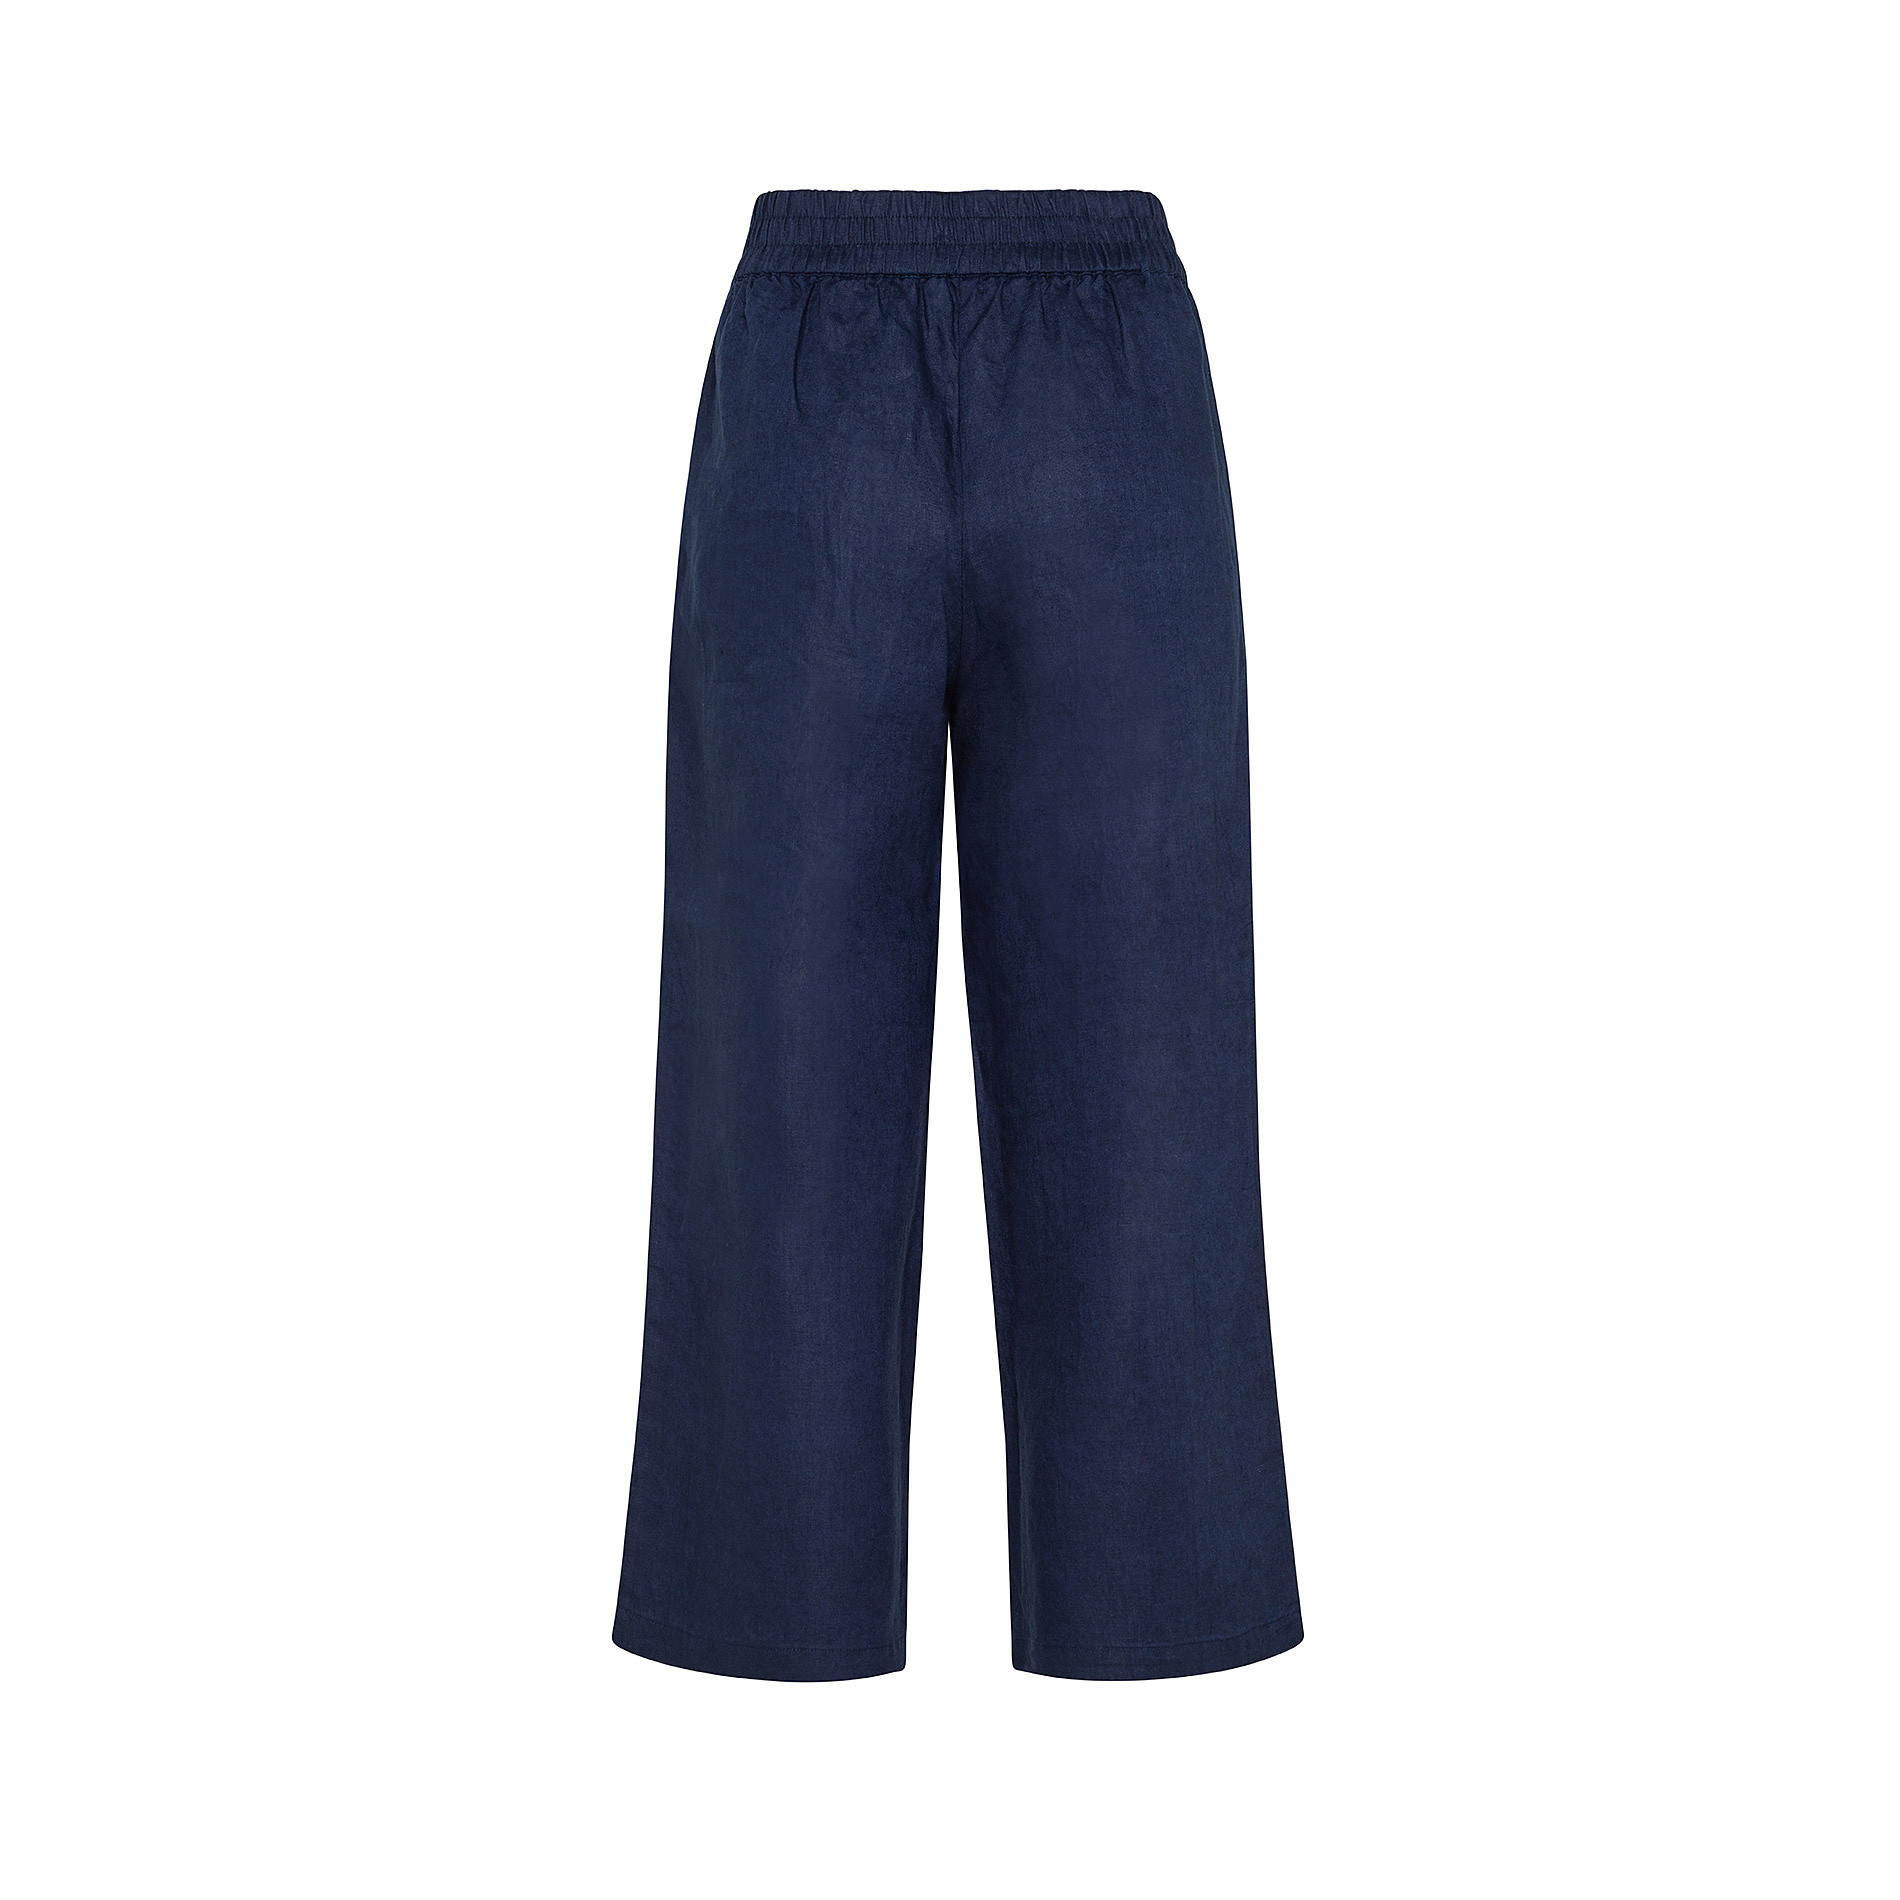 Pantalone puro lino con fusciacca Koan, Blu scuro, large image number 0